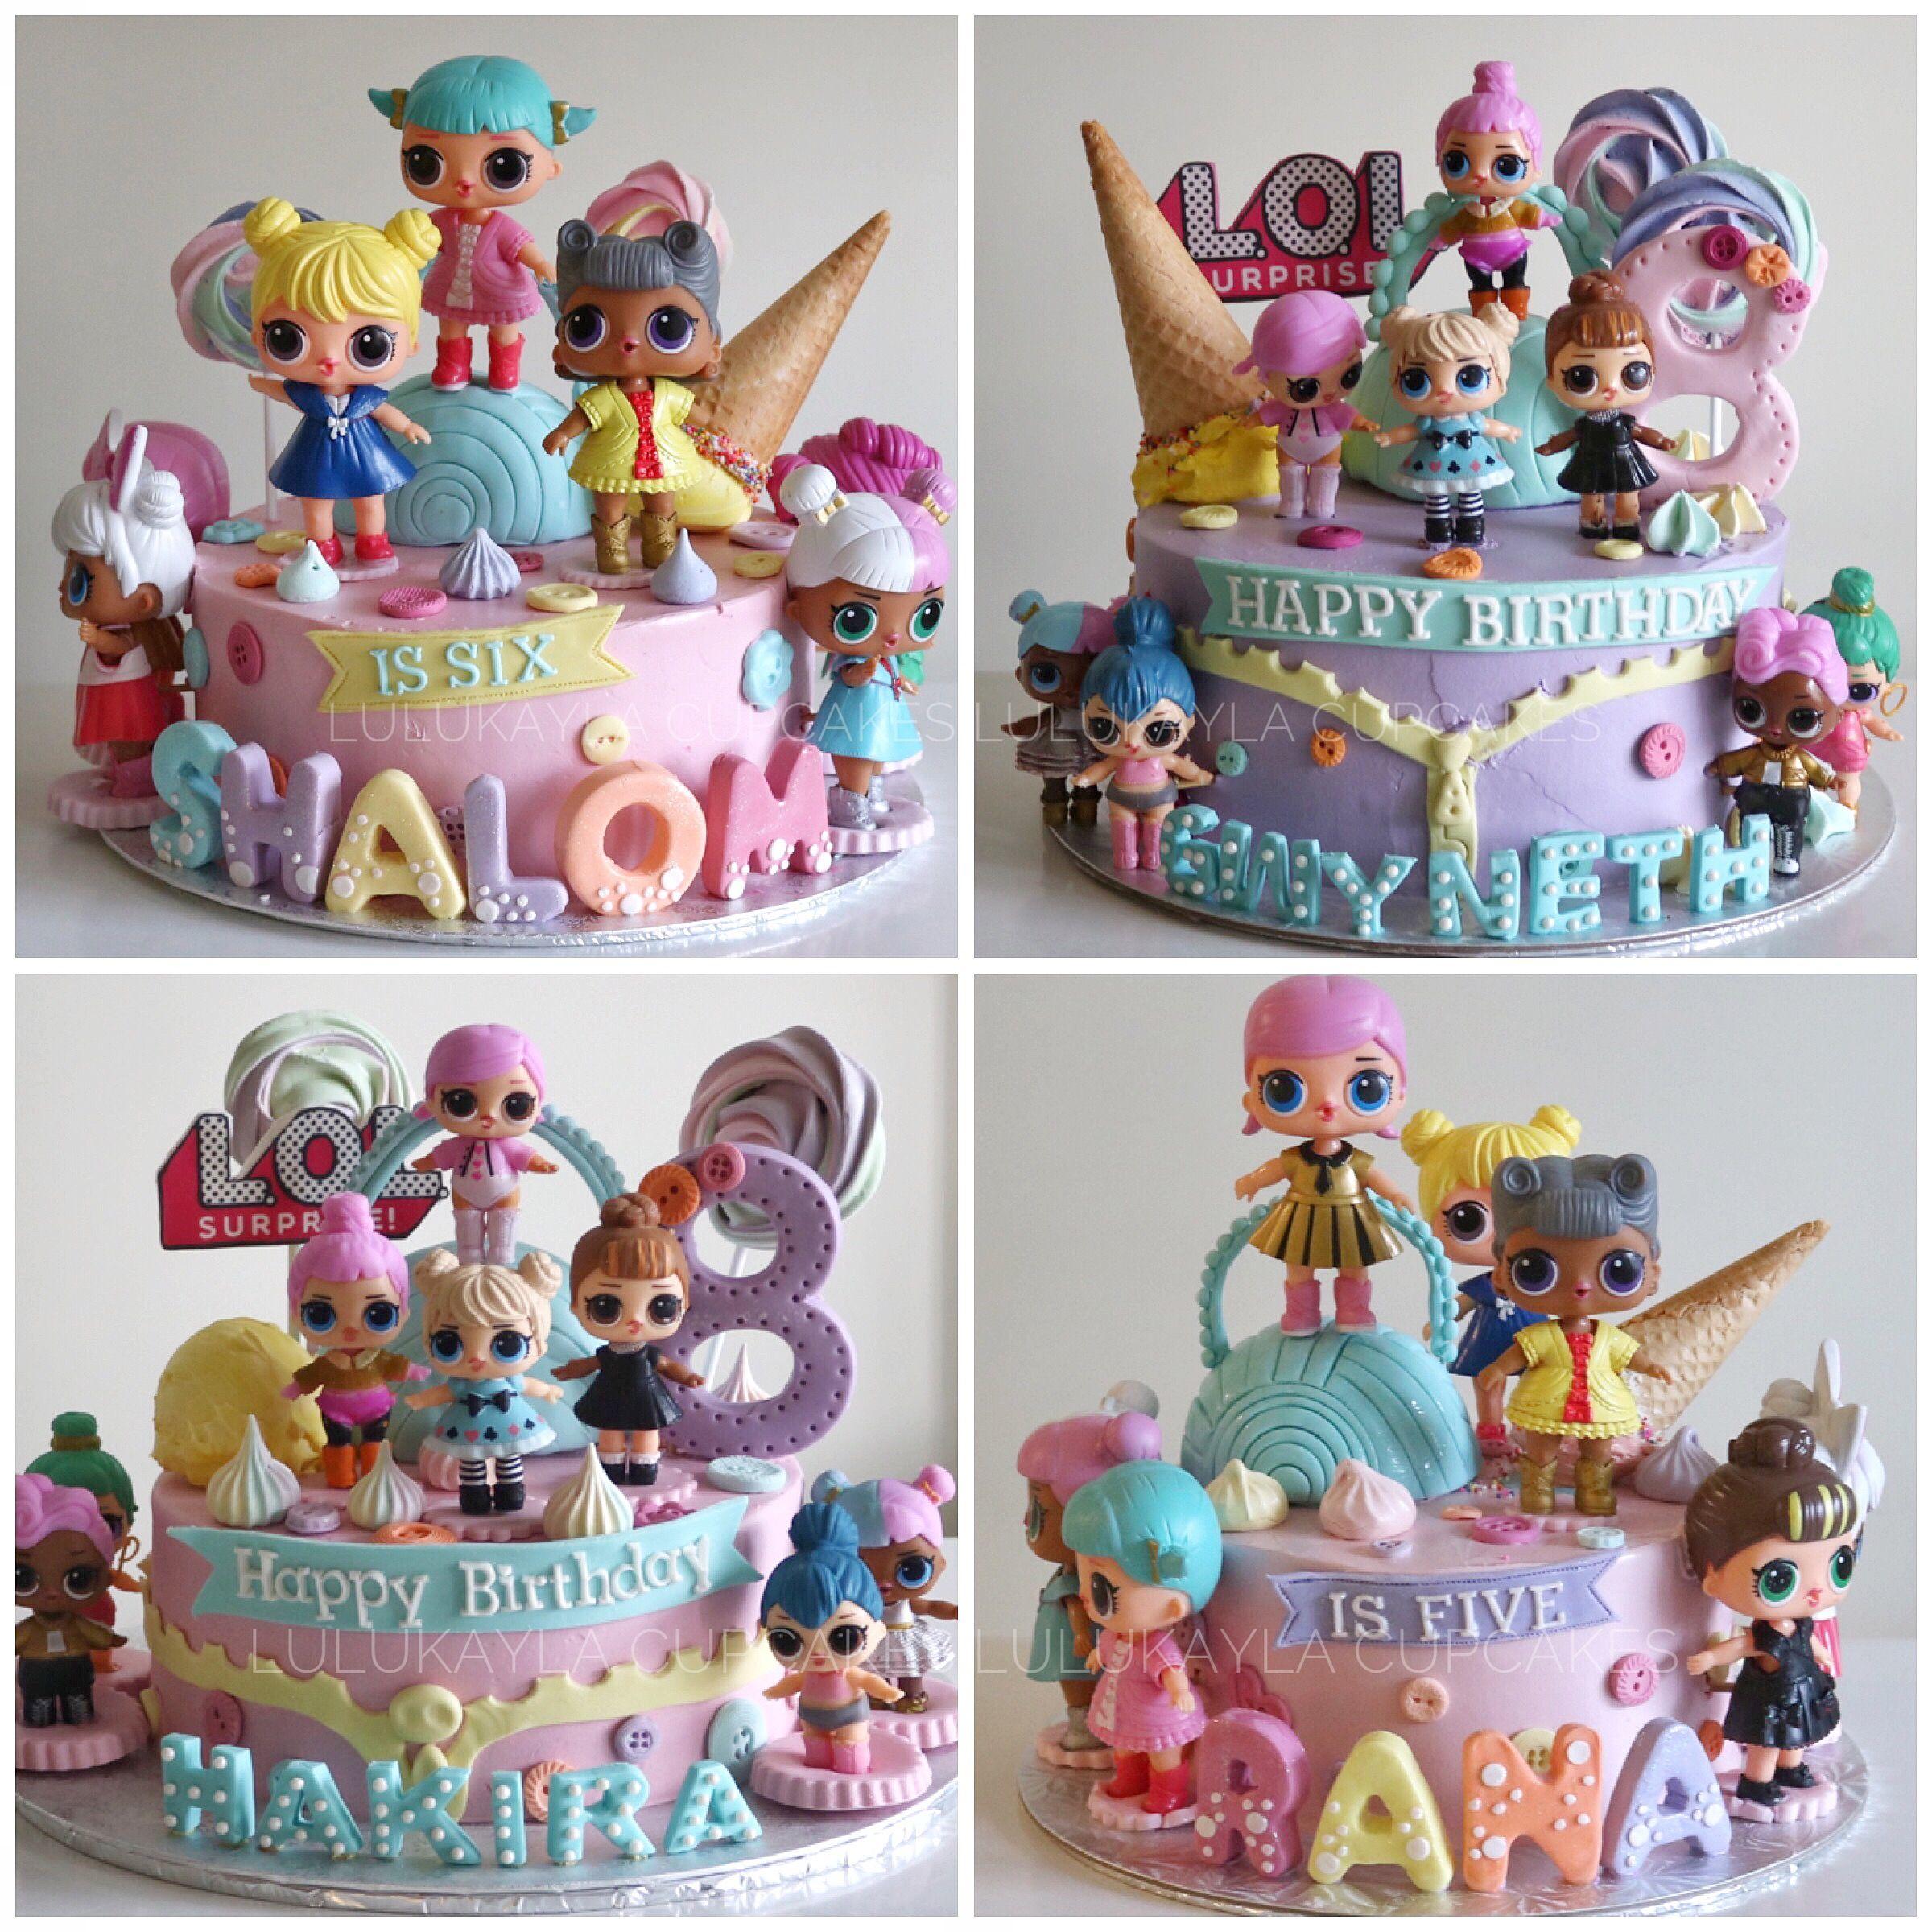 Lol Surprise Cake Funny Birthday Cakes Lol Doll Cake Doll Cake